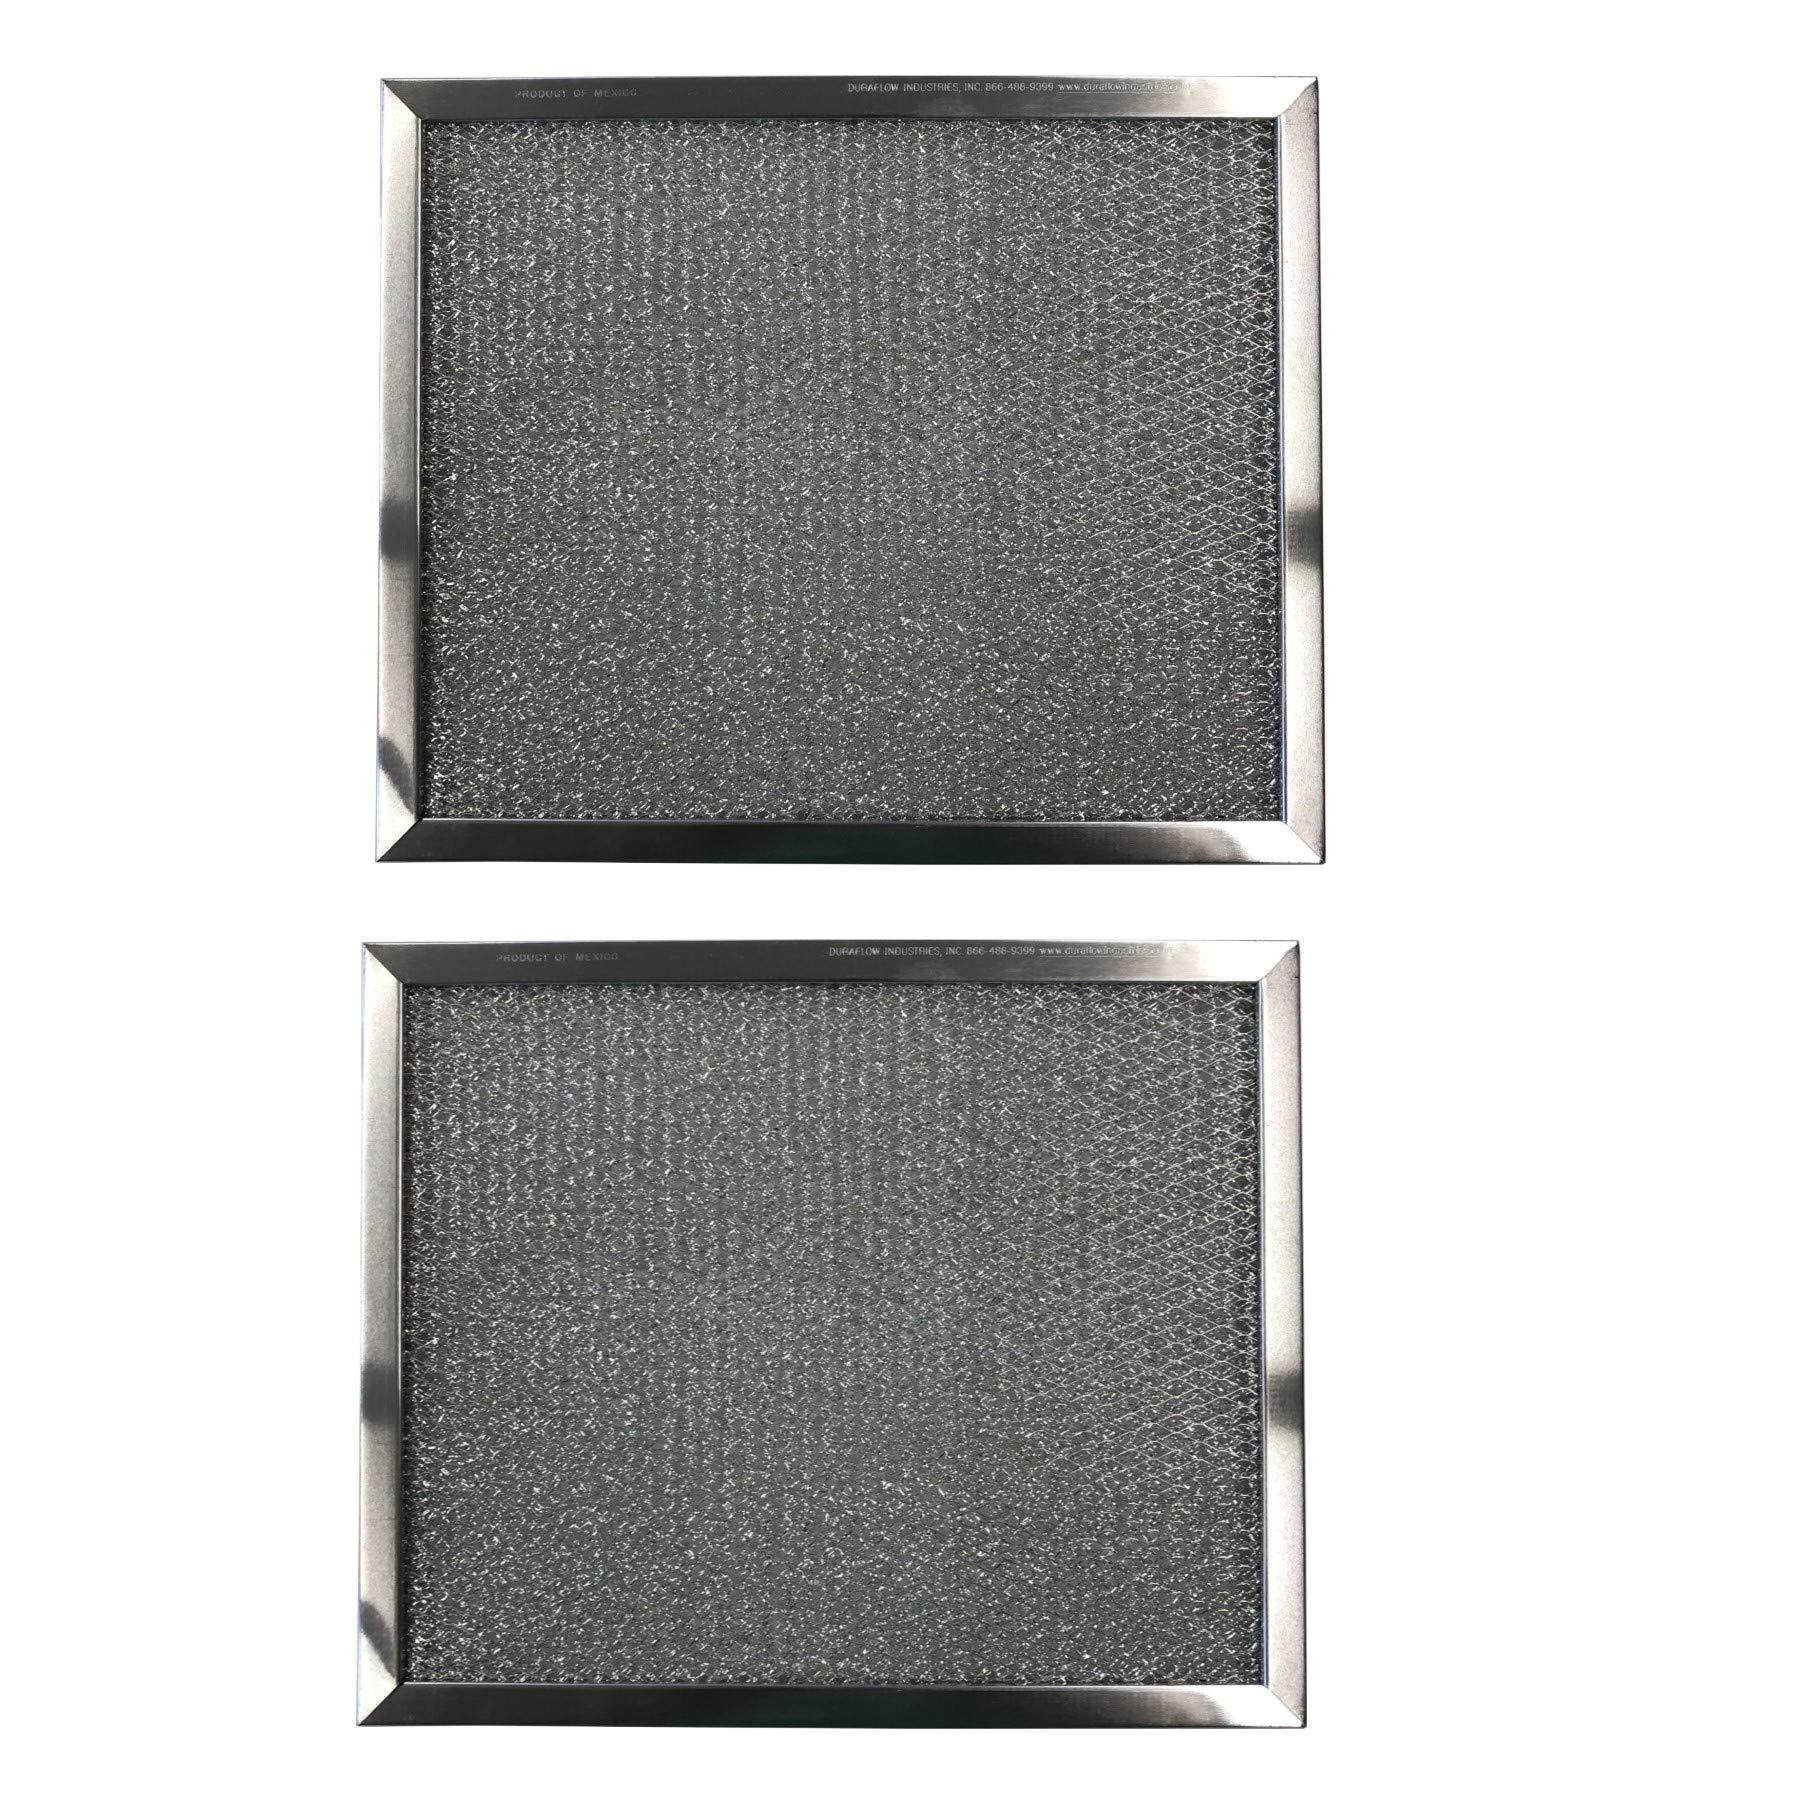 Aluminum Replacement Range Filters Compatible With Broan 99010033, S97009562, S99010033, BP10  Dimen